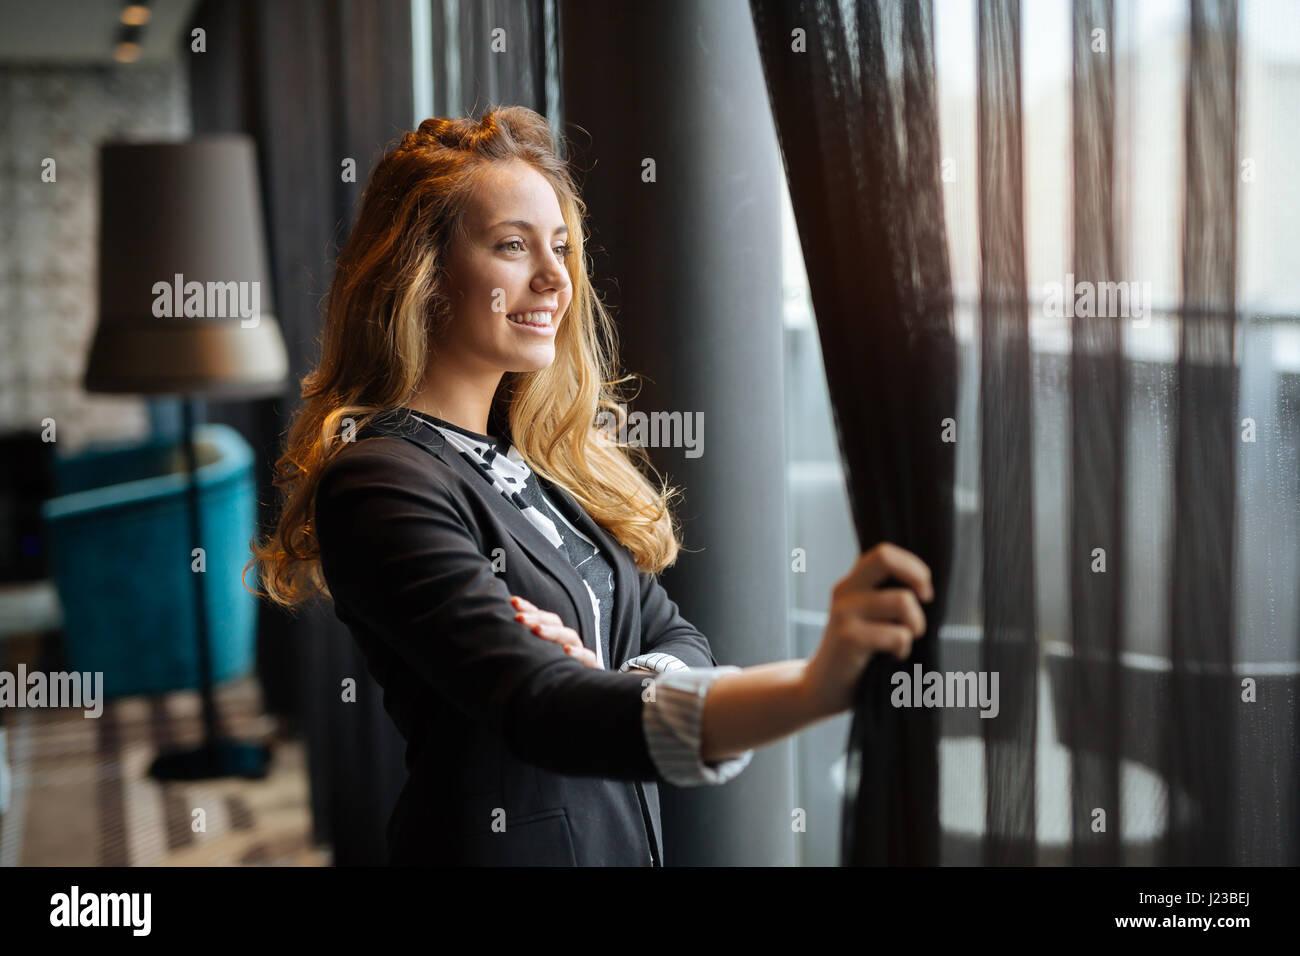 Glamorous happy  woman  staring through window - Stock Image